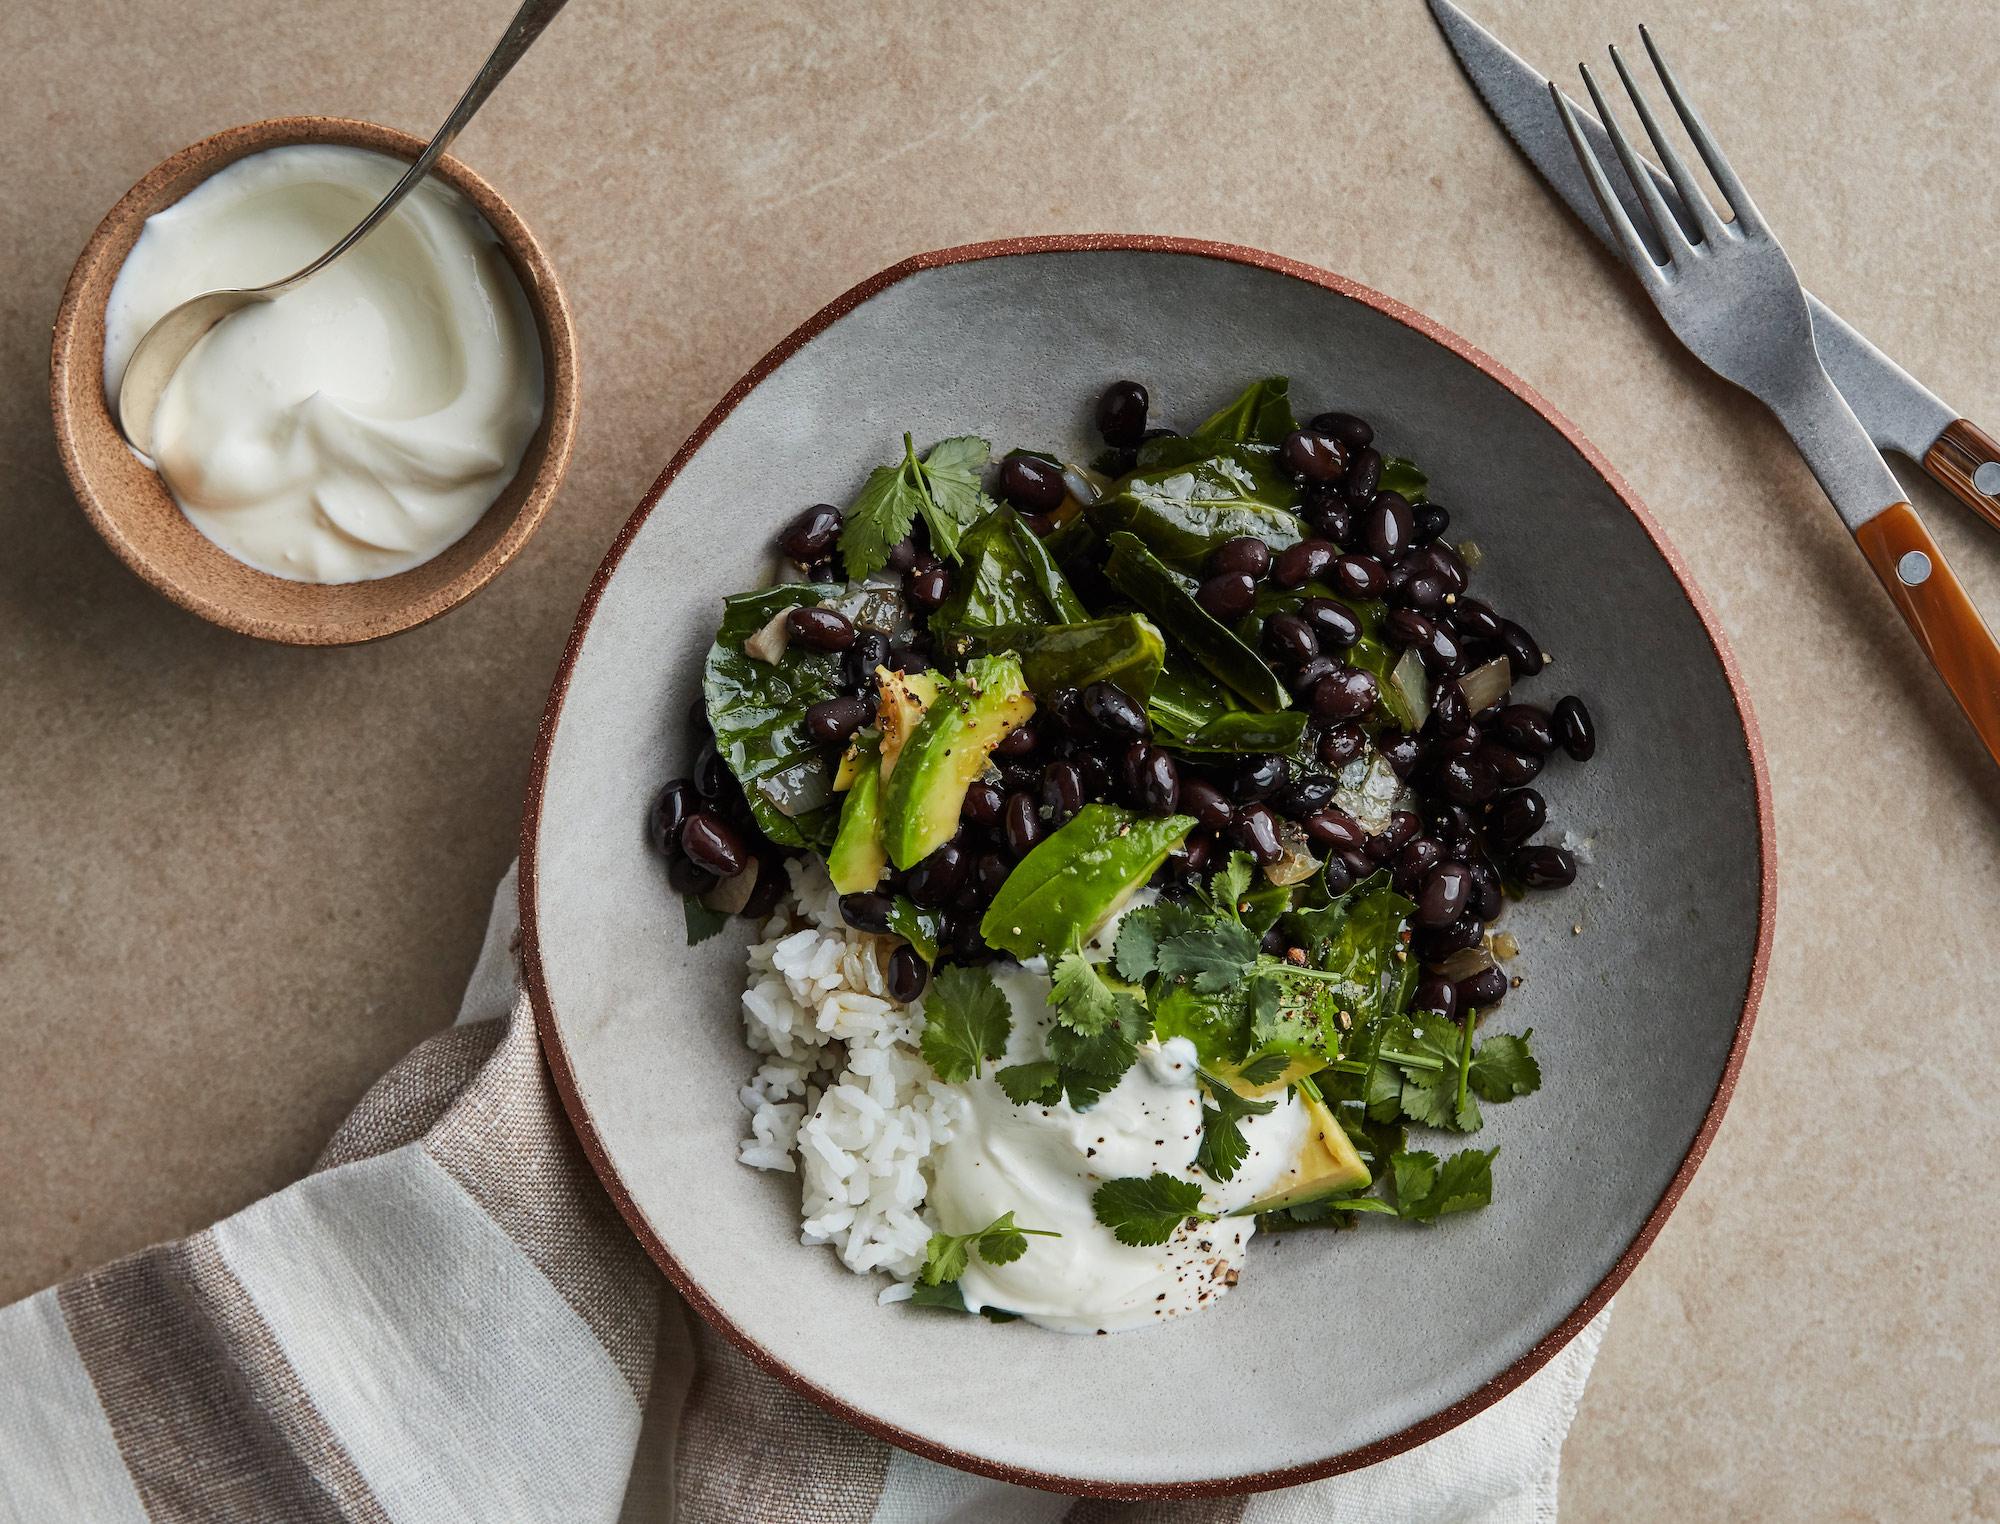 Smoky Black Beans and Vinegar-Braised Collards